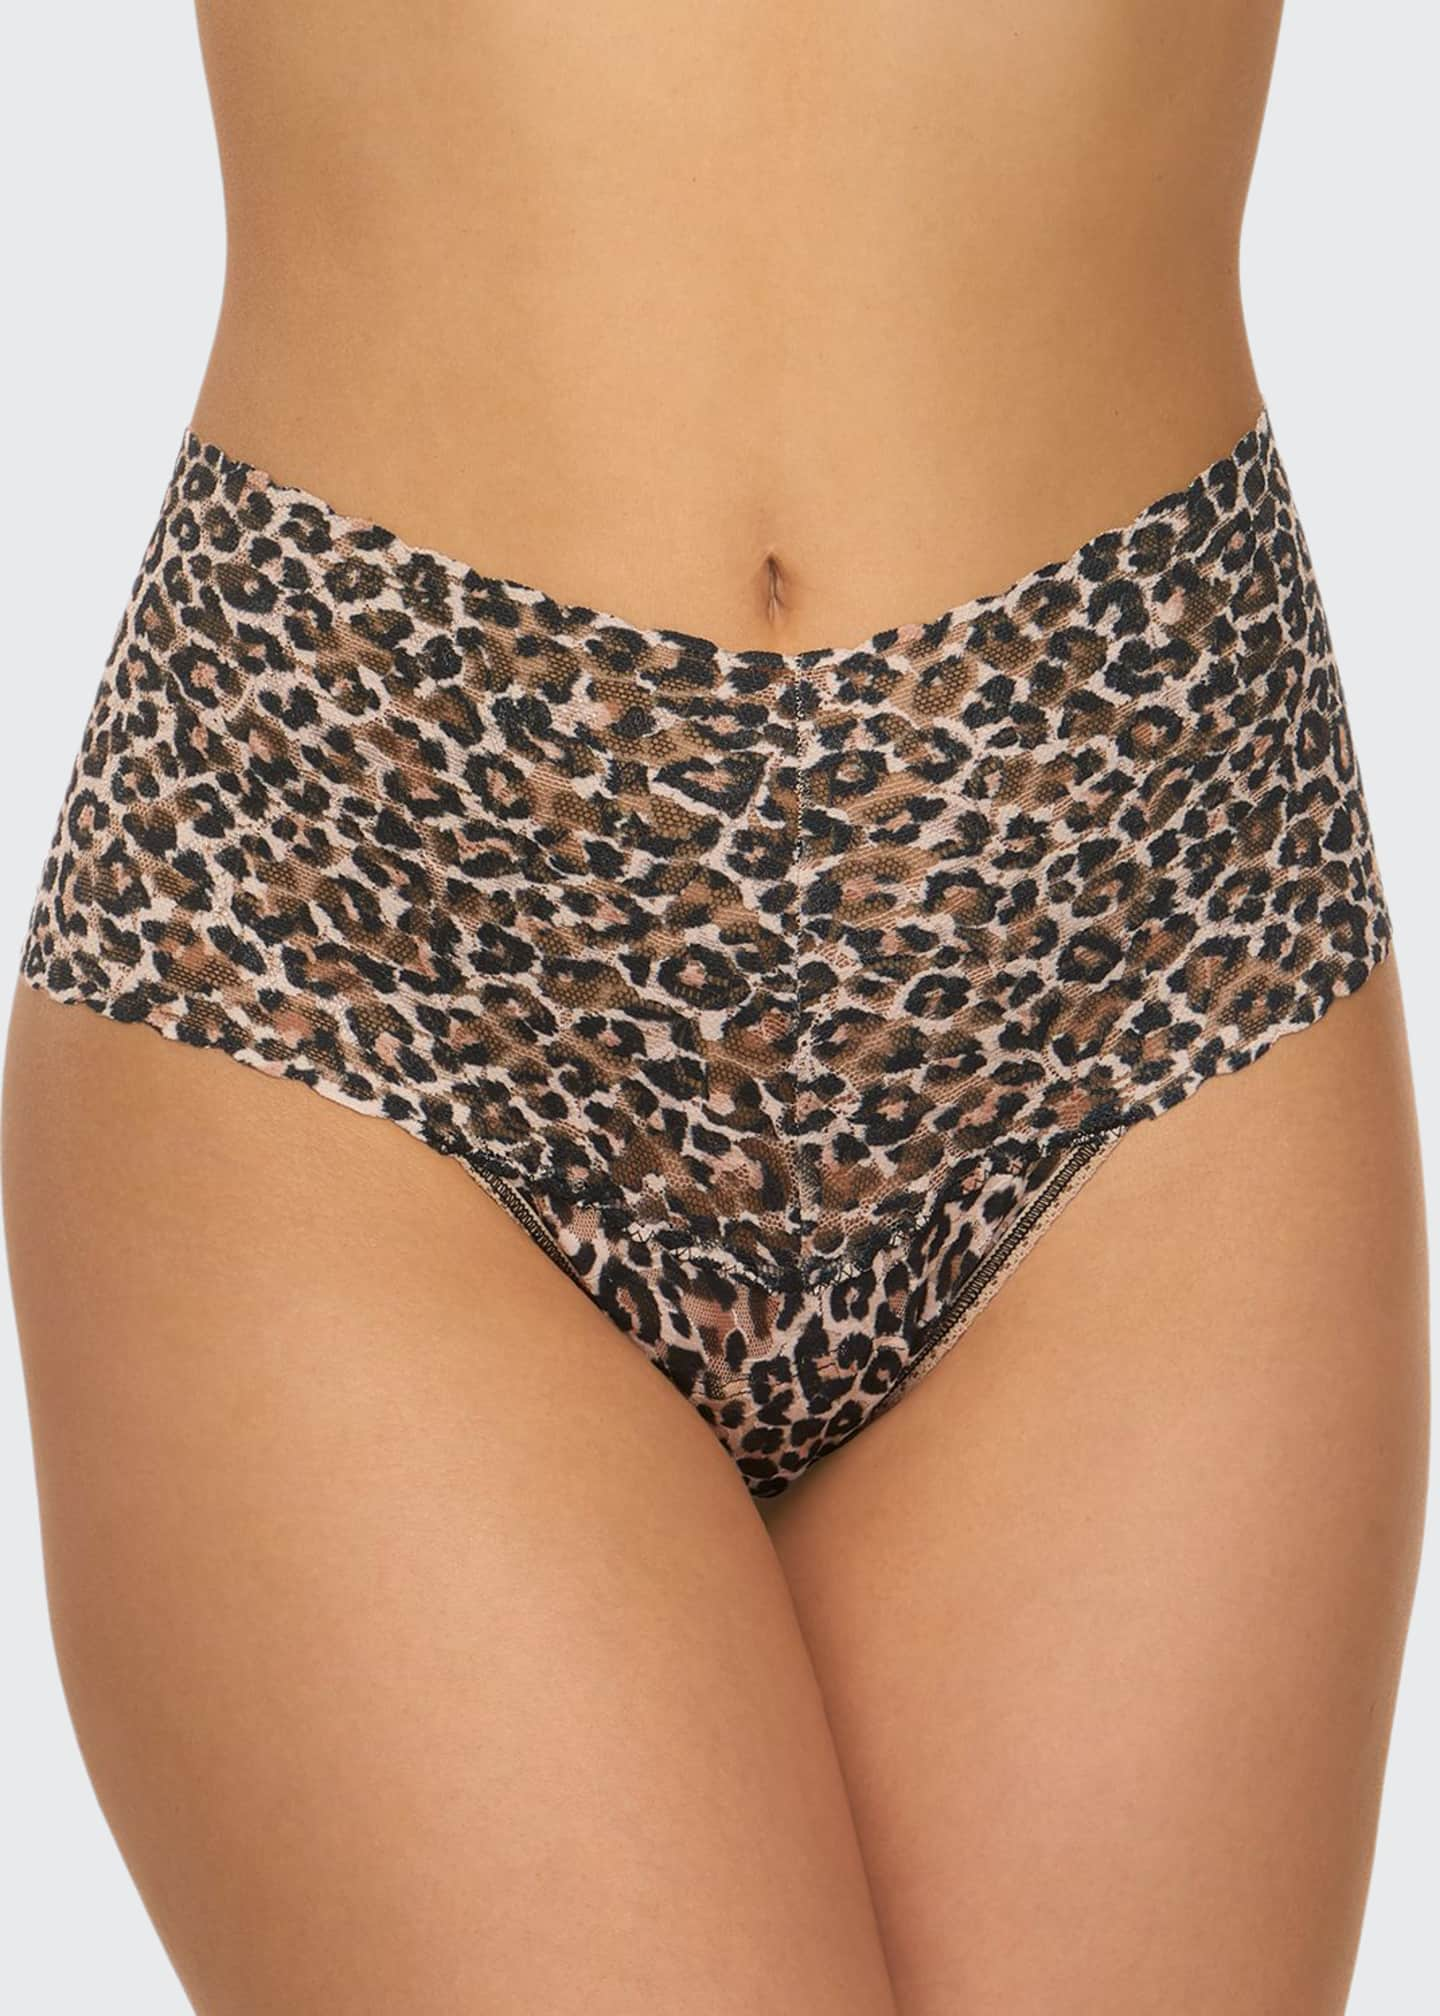 Hanky Panky Leopard-Pattern Lace Retro Thong